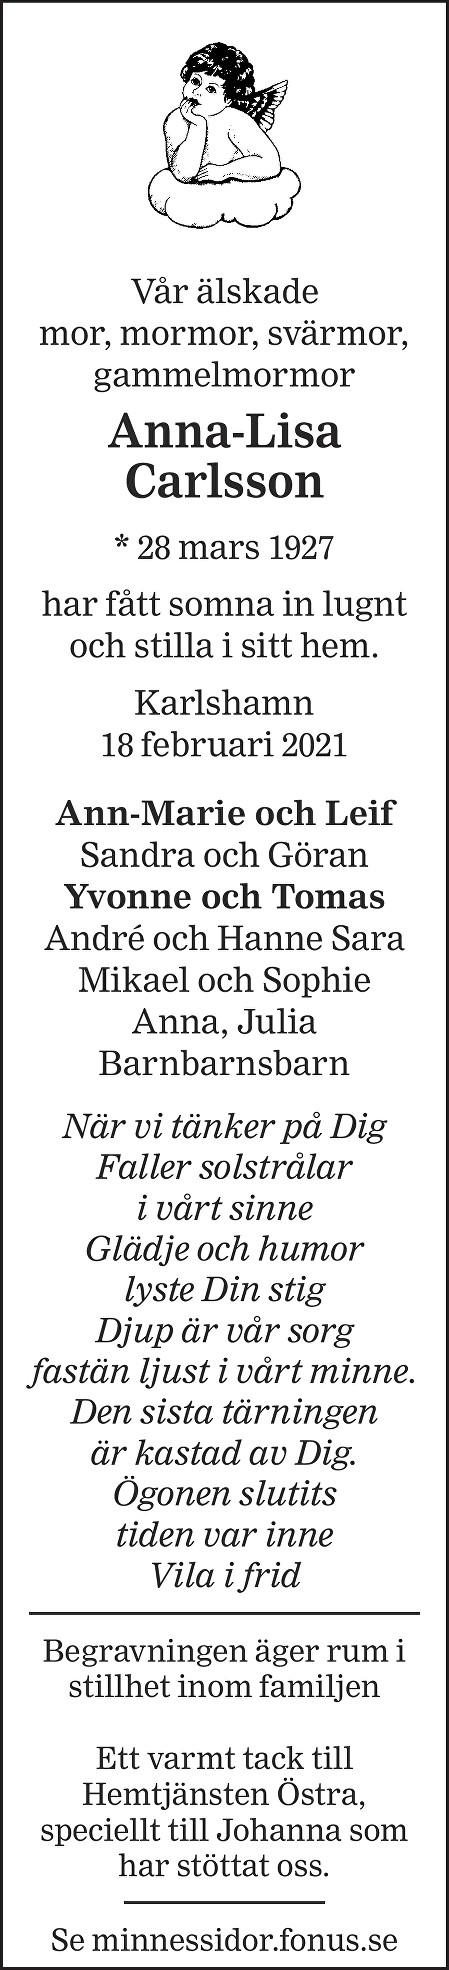 Anna-Lisa Carlsson Death notice